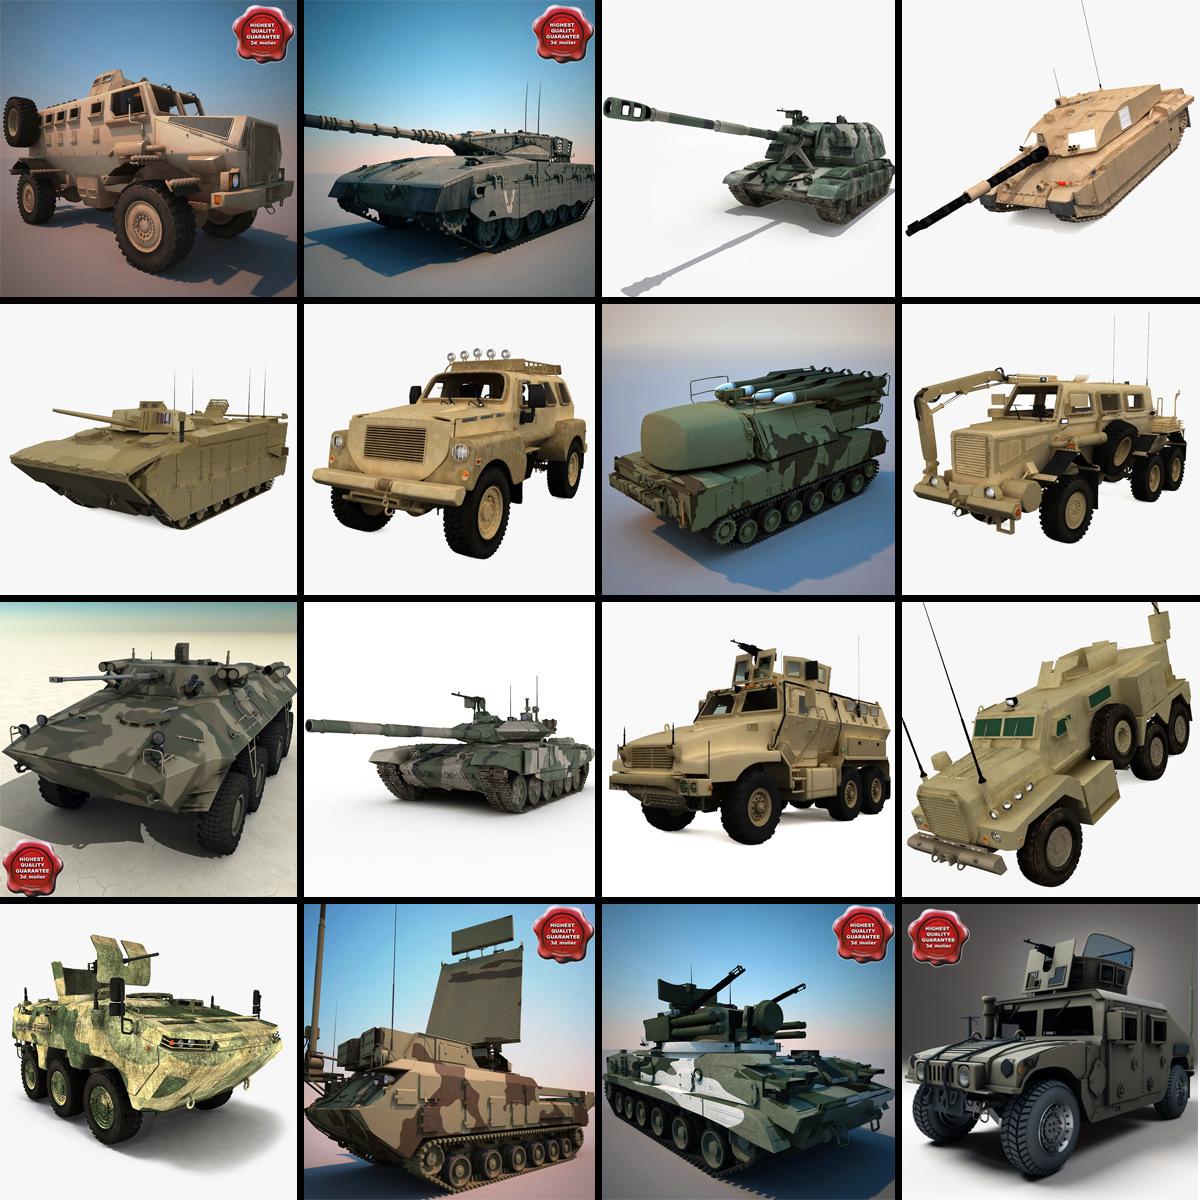 Tanks_Collection_V13_000.jpg